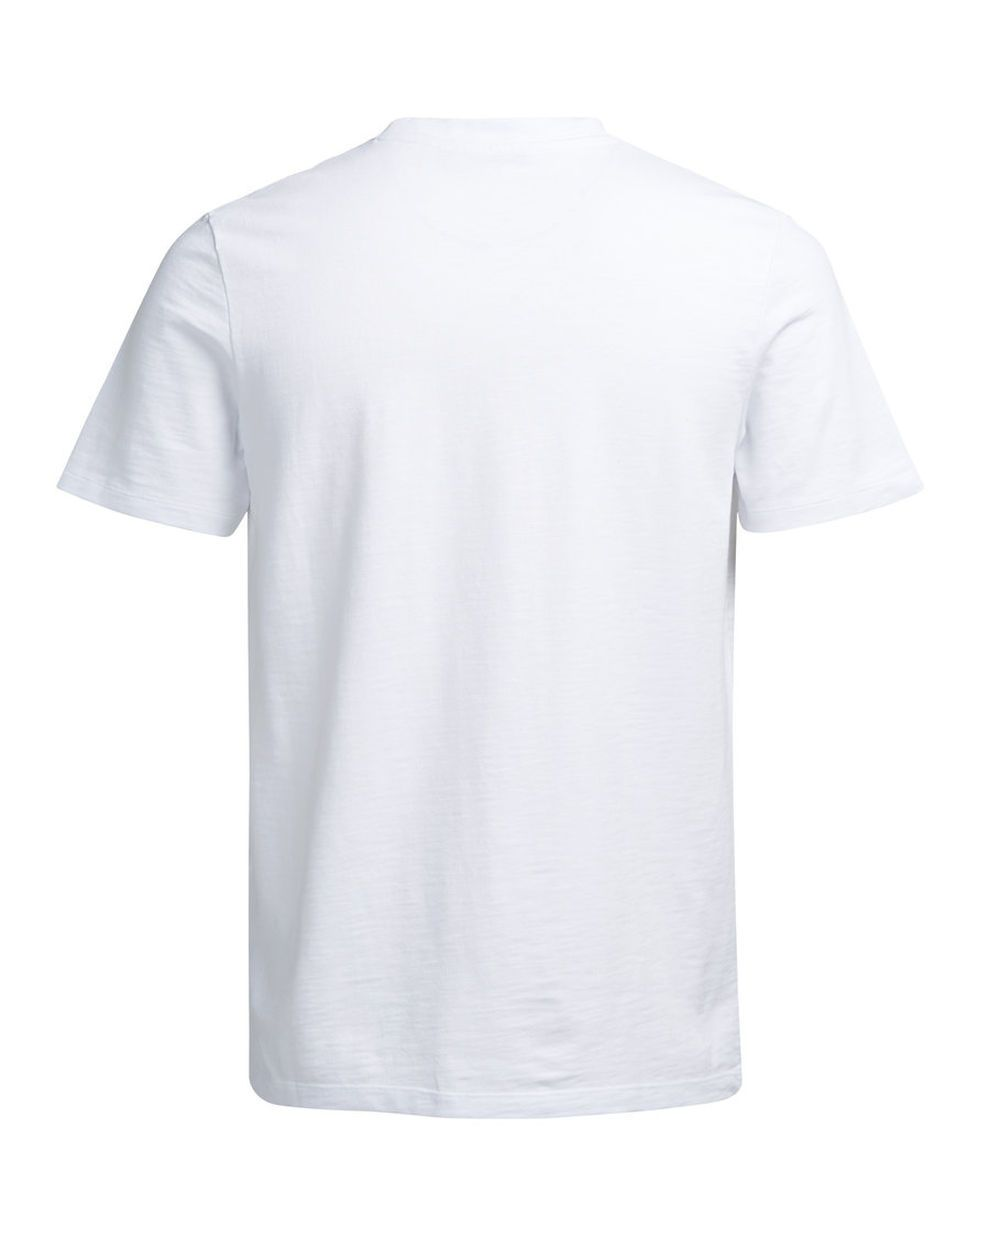 Short Sleeved T Shirt Impact Men Pinterest Shirts And Nautica Napibz002 Biru Ring Hitam